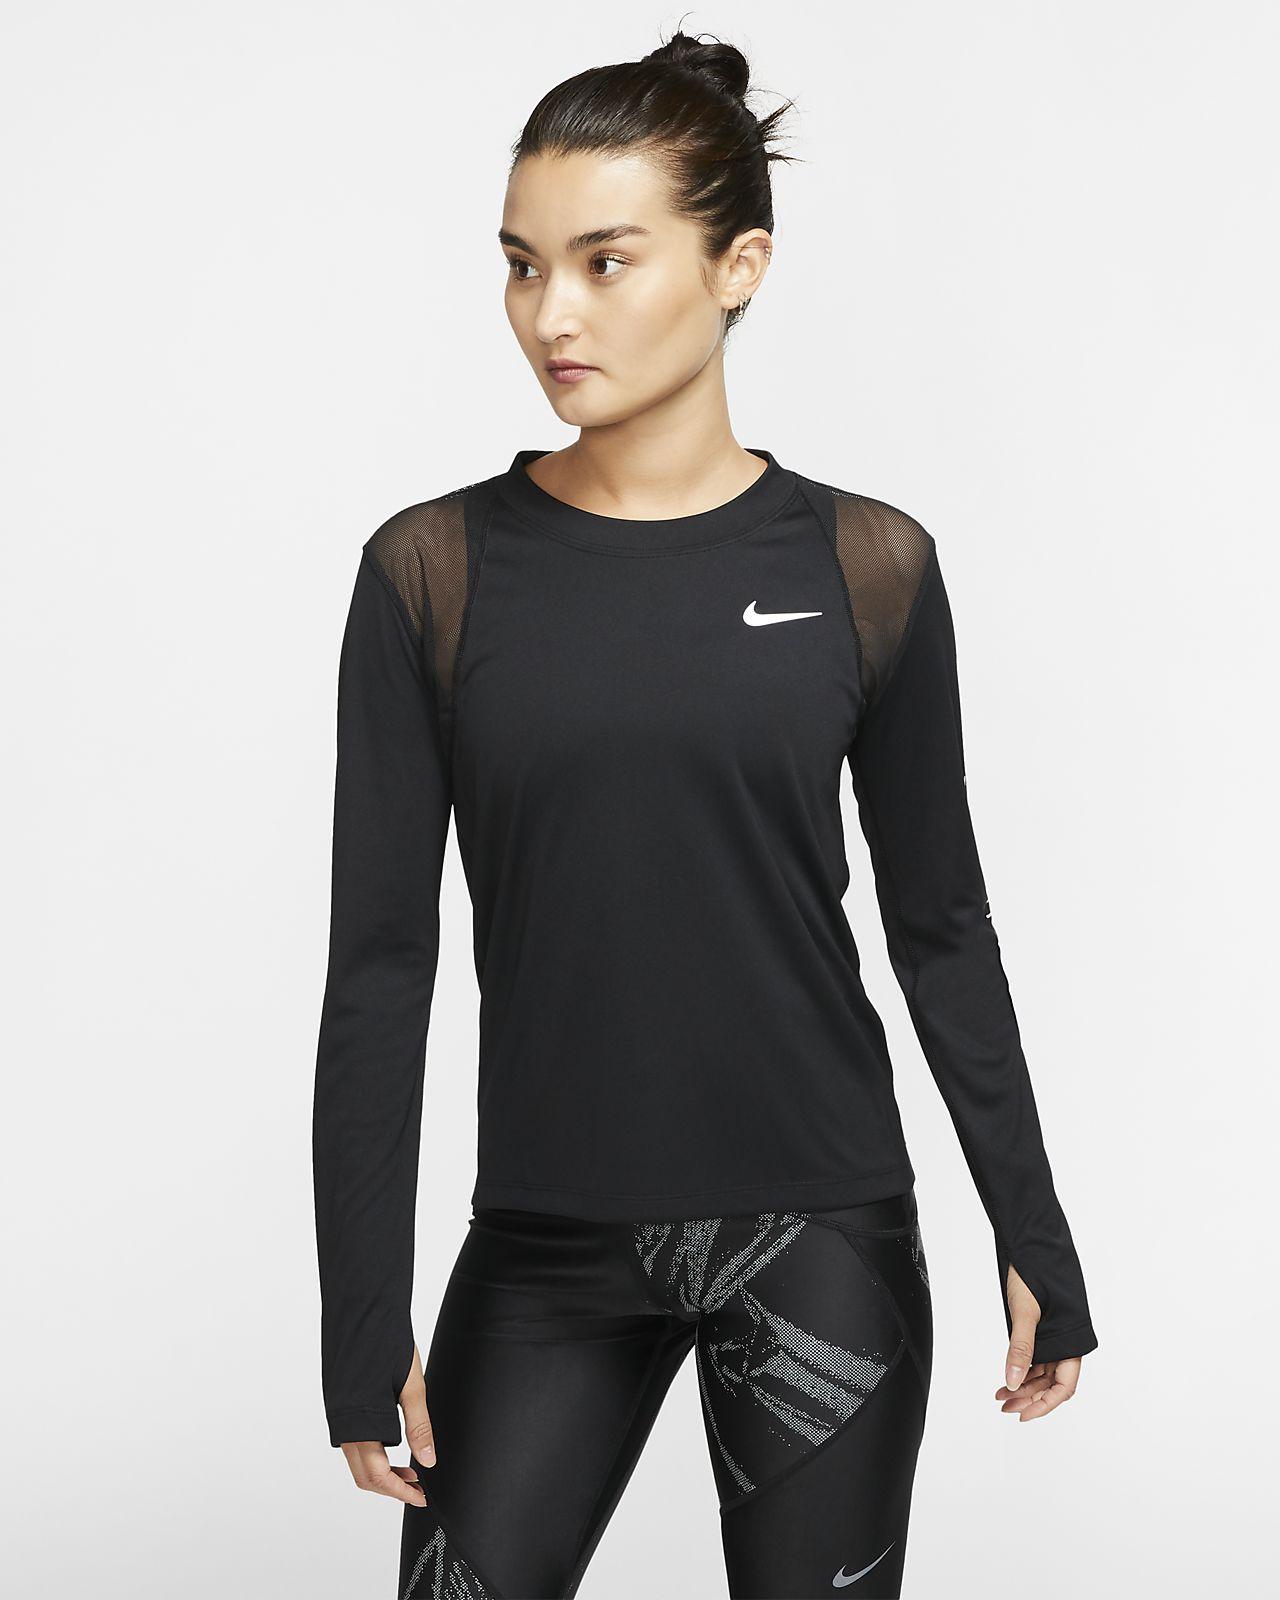 Nike Dri-FIT Miler Women's Long-Sleeve Running Top